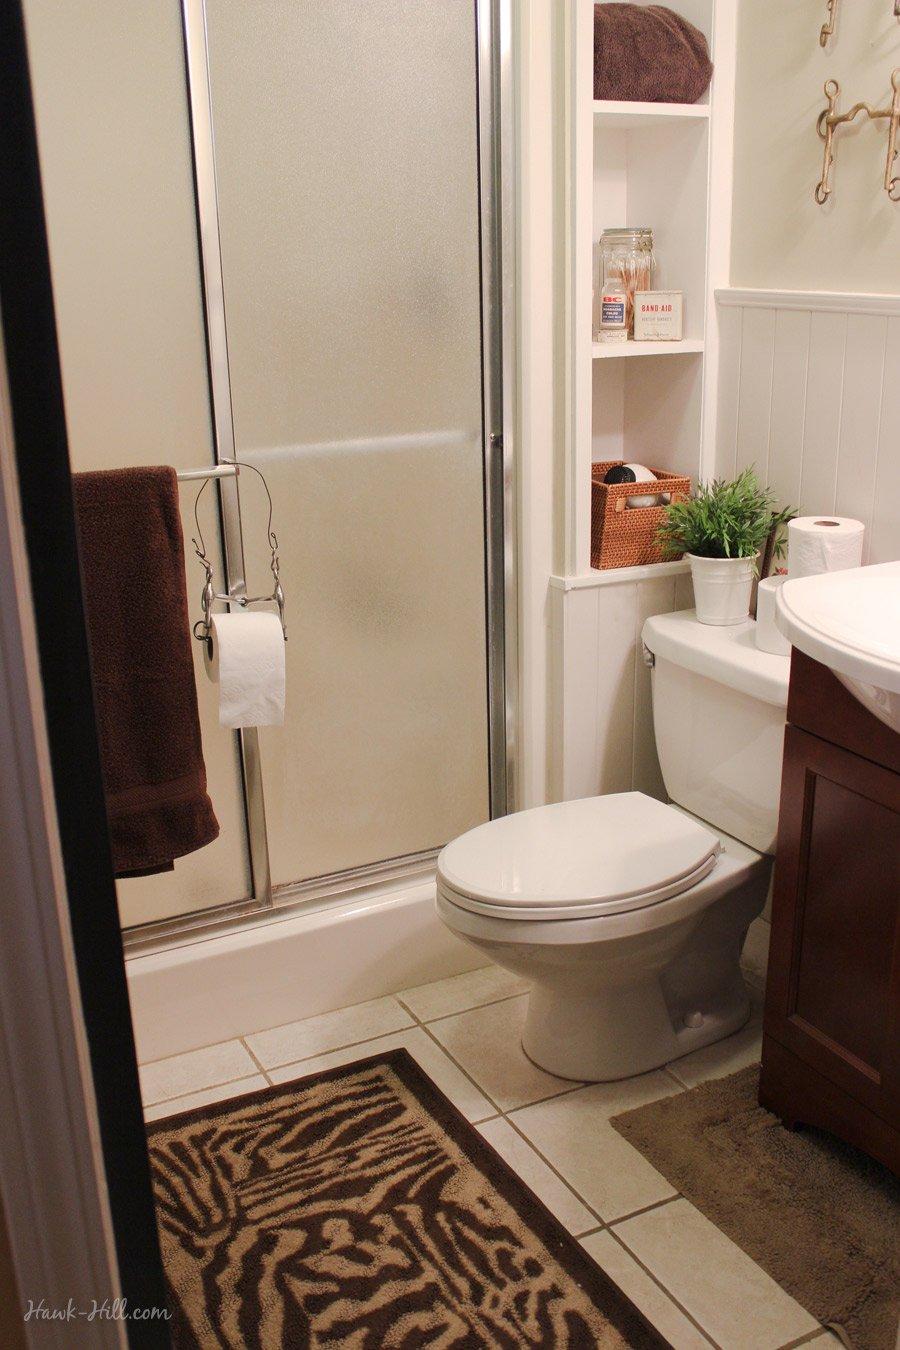 300 Bathroom Remodel Installing Shiplap Or Paneling